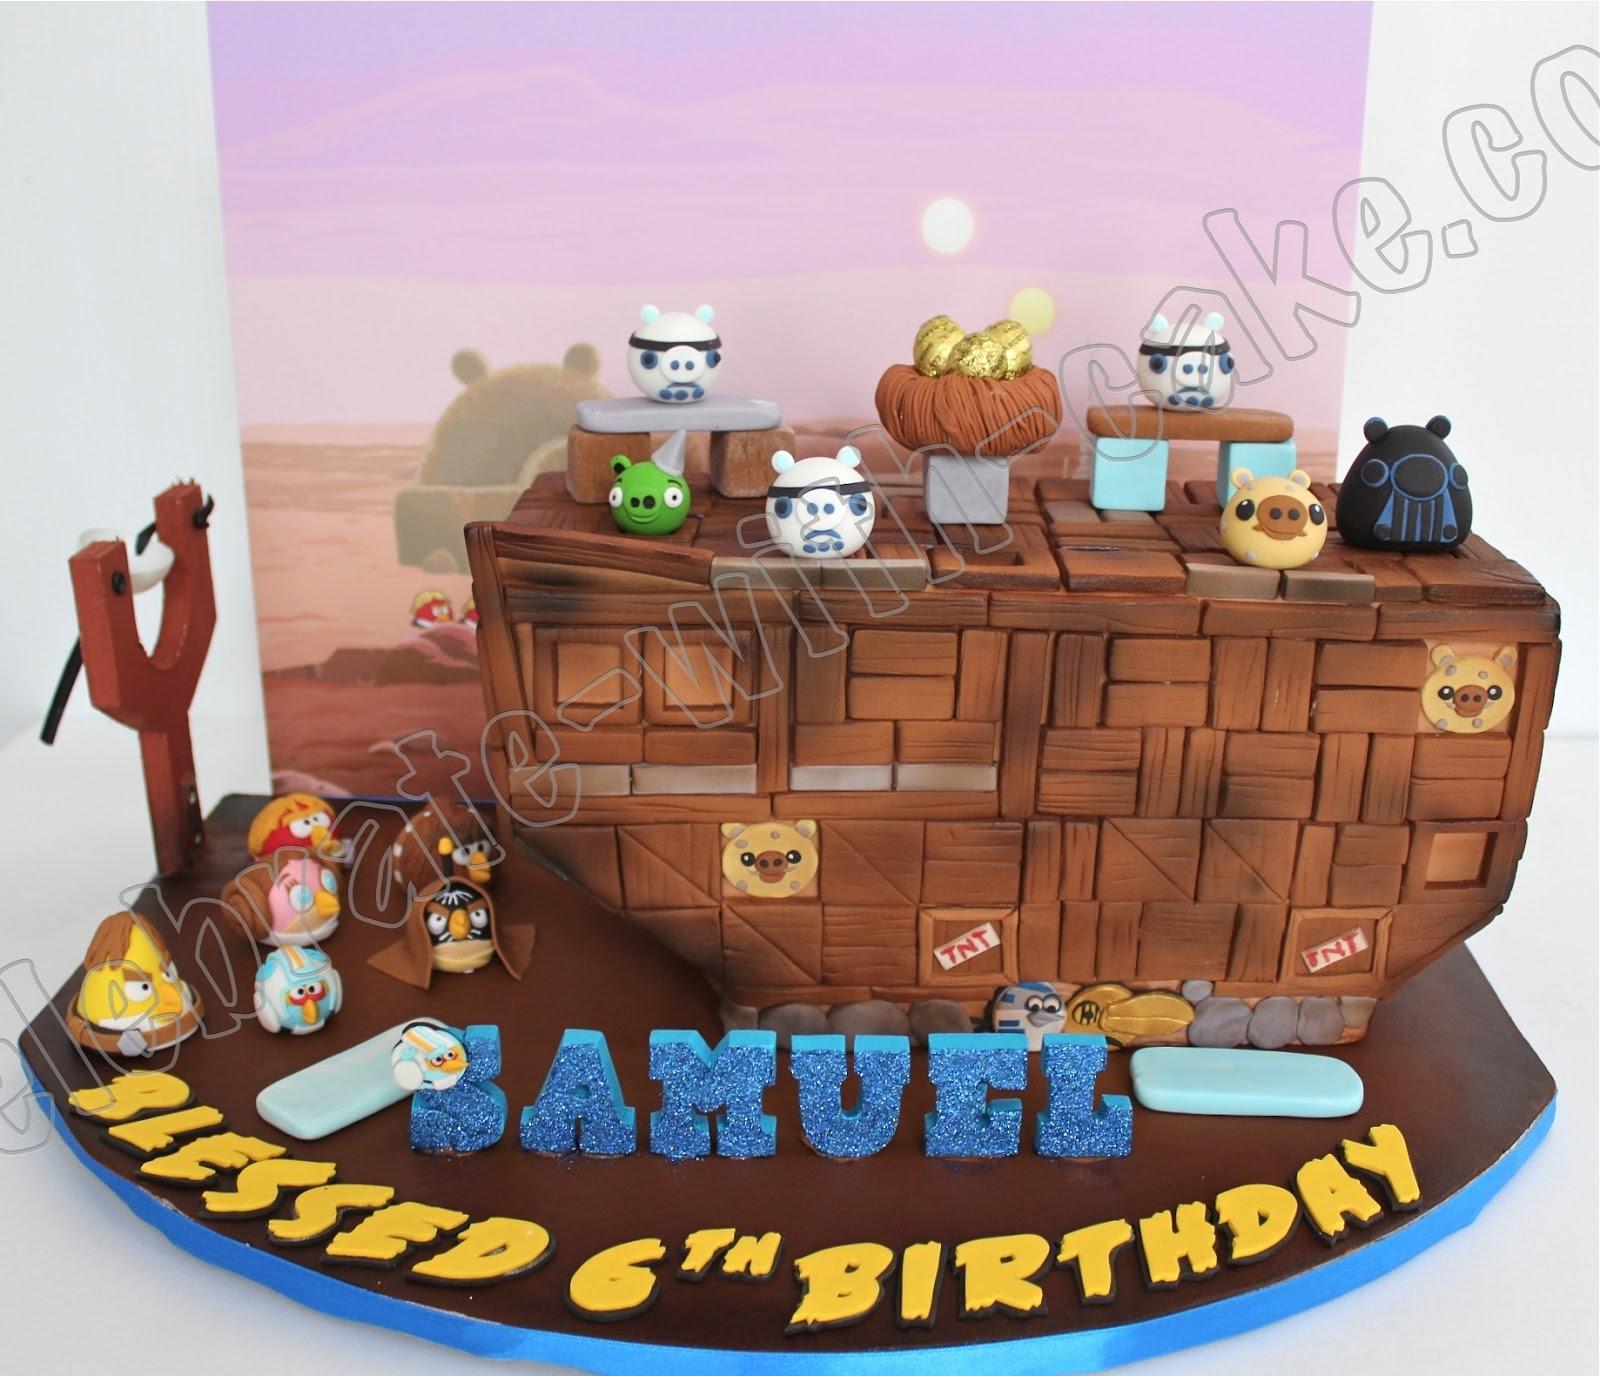 Playable Angry Birds Star Wars Cake